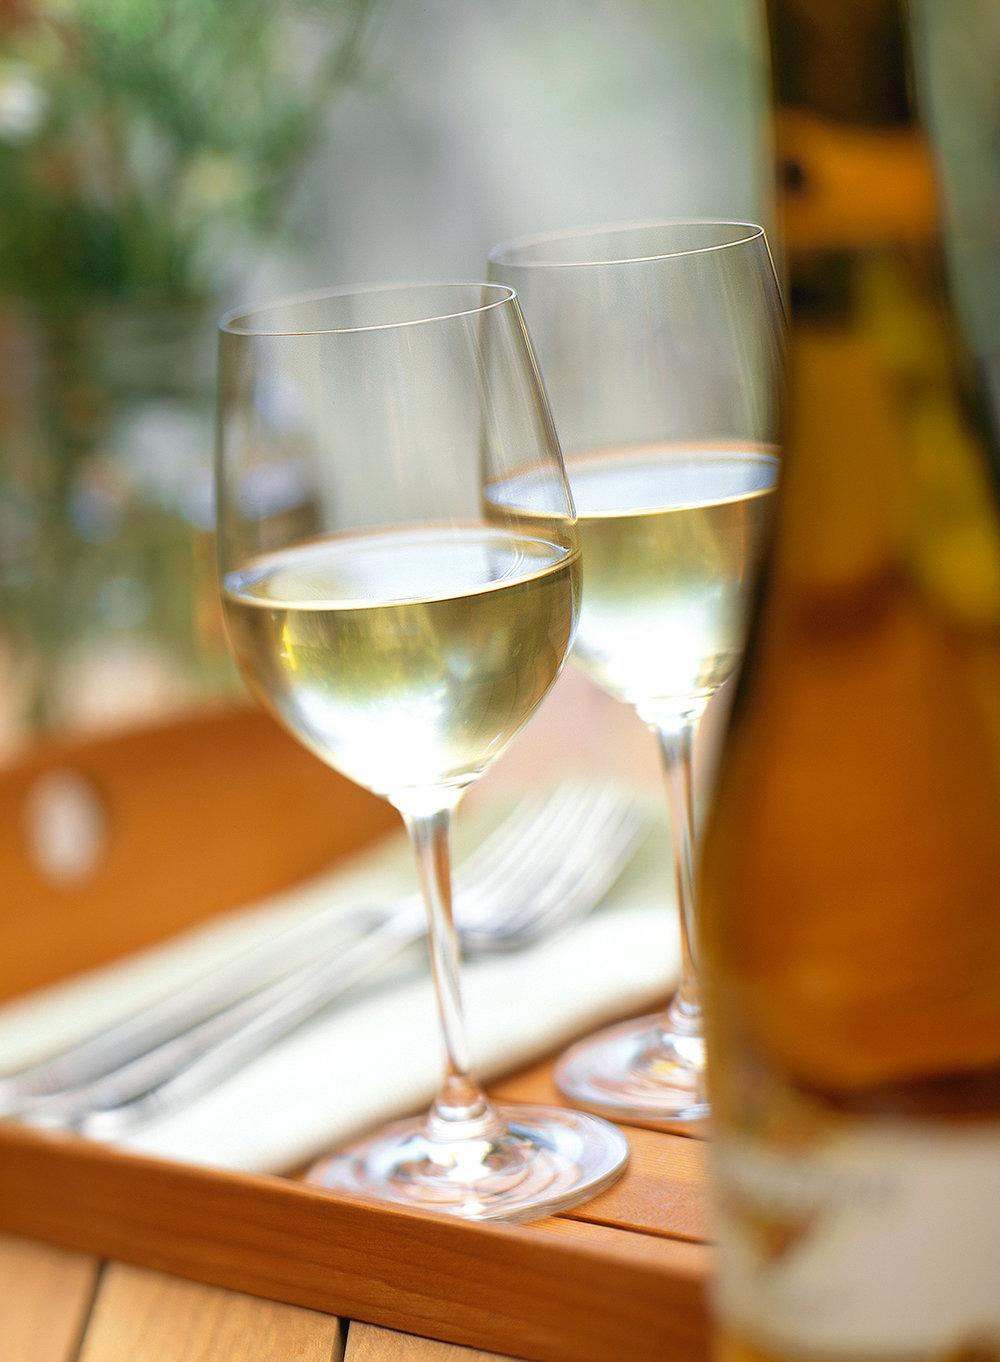 21_Wine_on_wood_tray_original.jpg